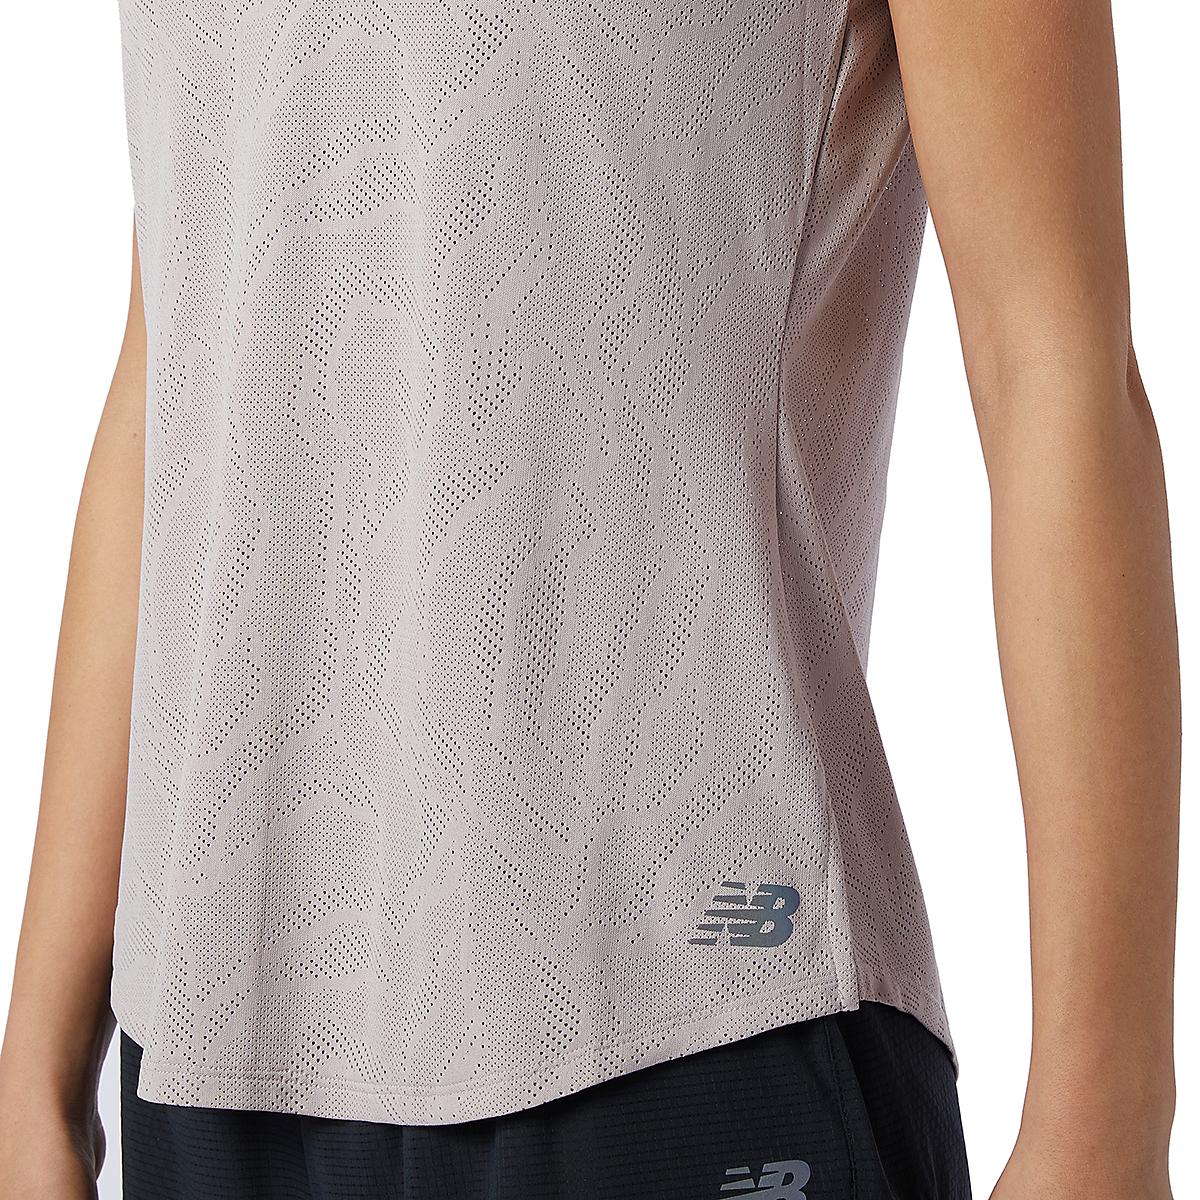 Women's New Balance Q Speed Fuel Jacquard Short Sleeve - Color: Logwood - Size: XS, Logwood, large, image 4